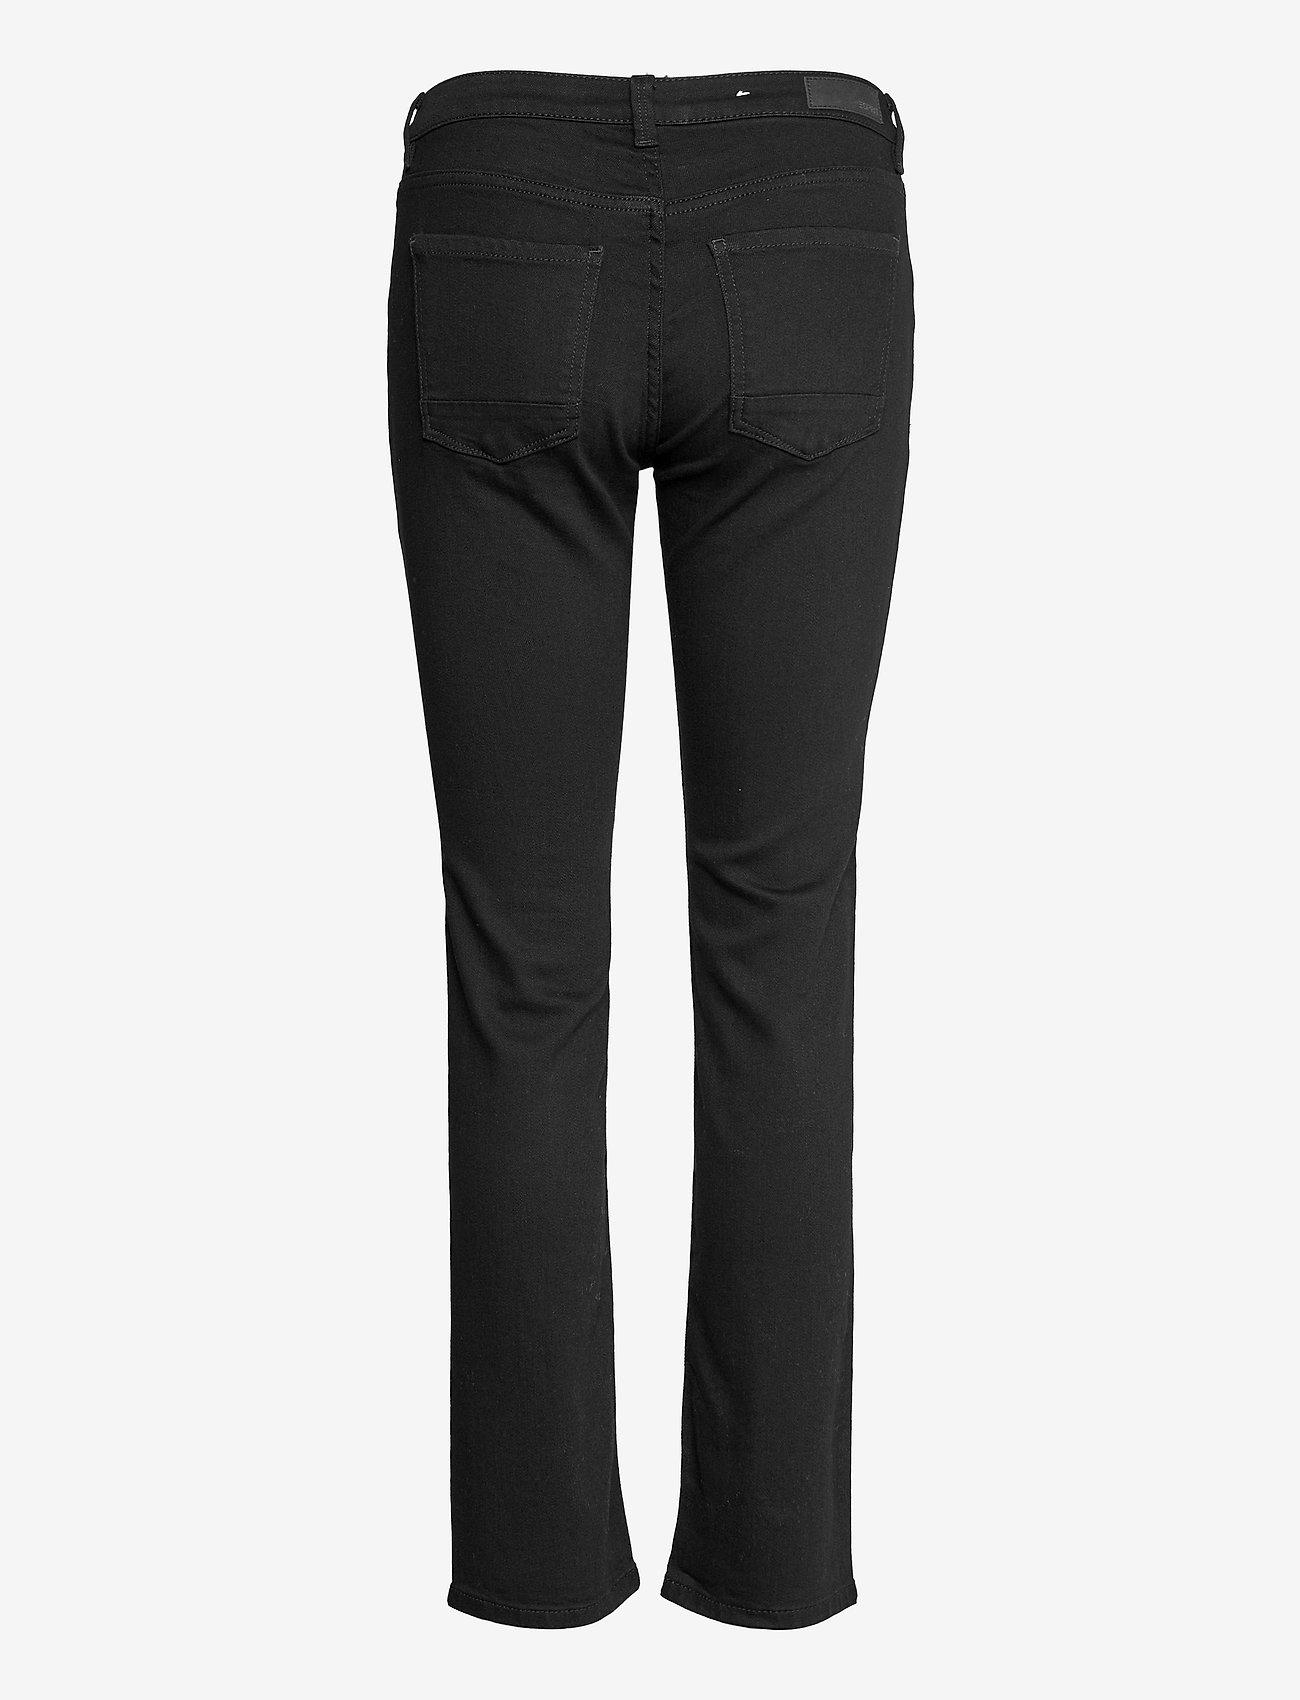 Esprit Casual - Pants denim - slim jeans - black rinse - 1